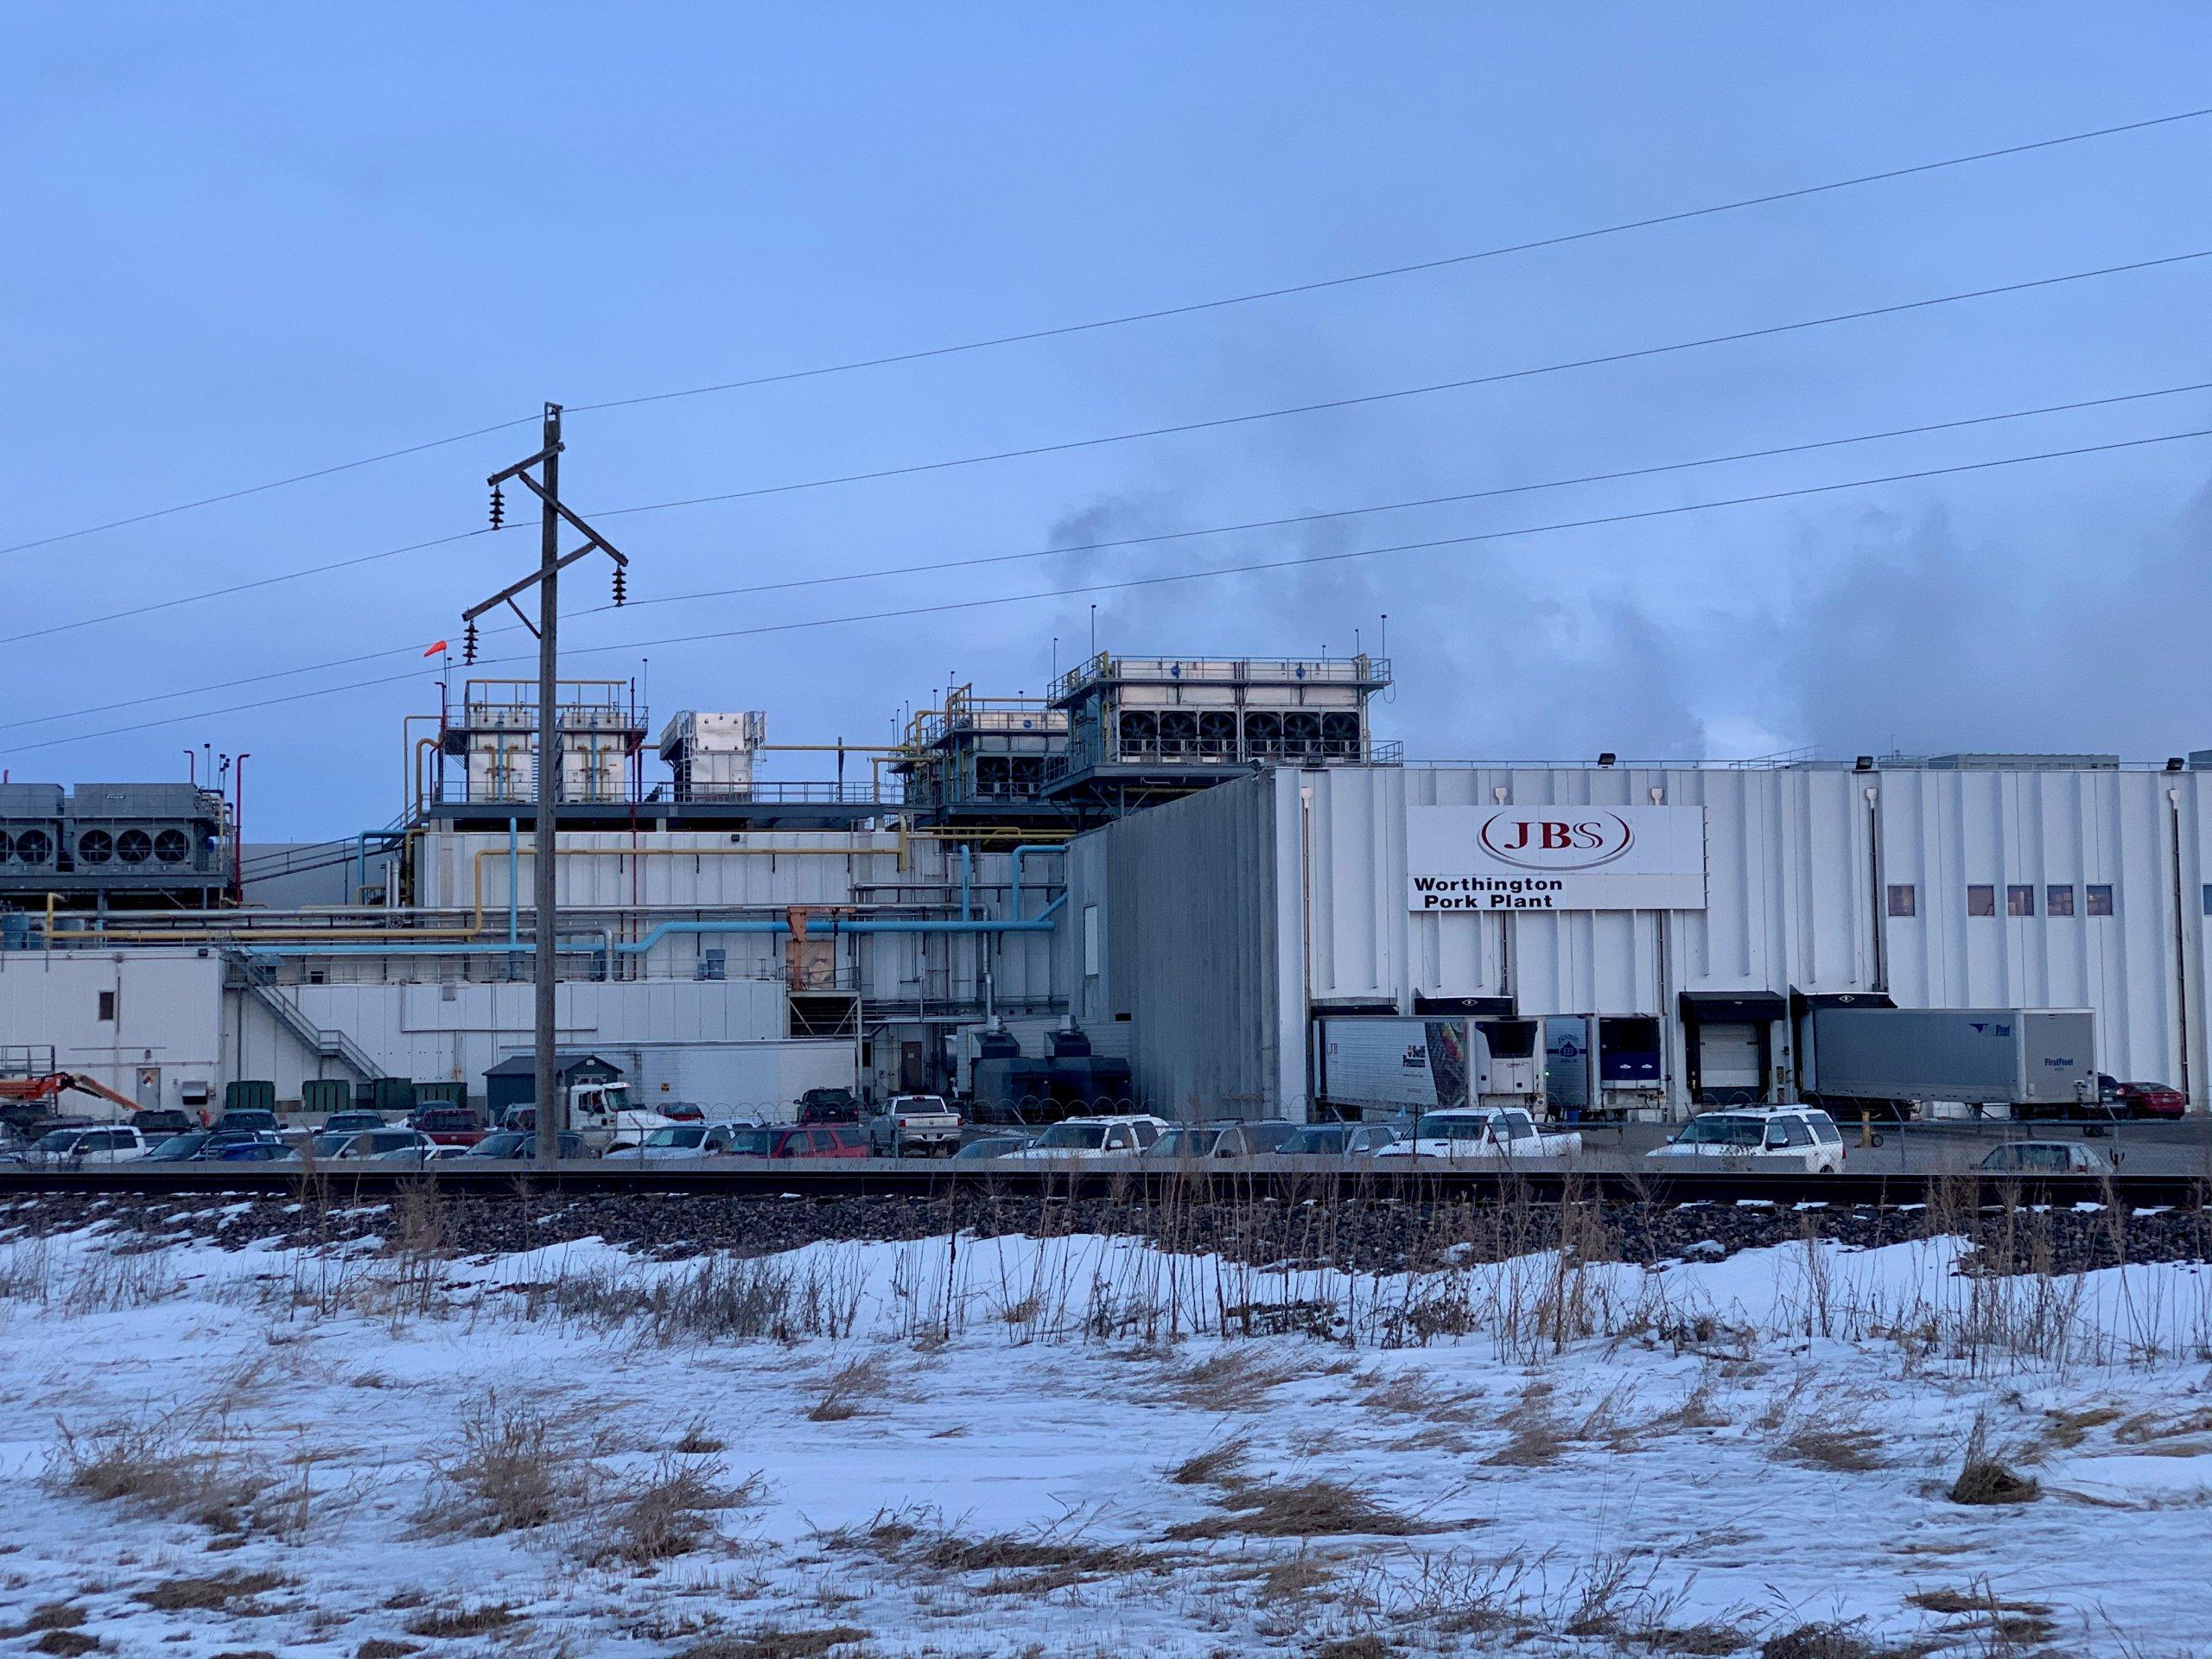 JBS pork processing plant in Worthington